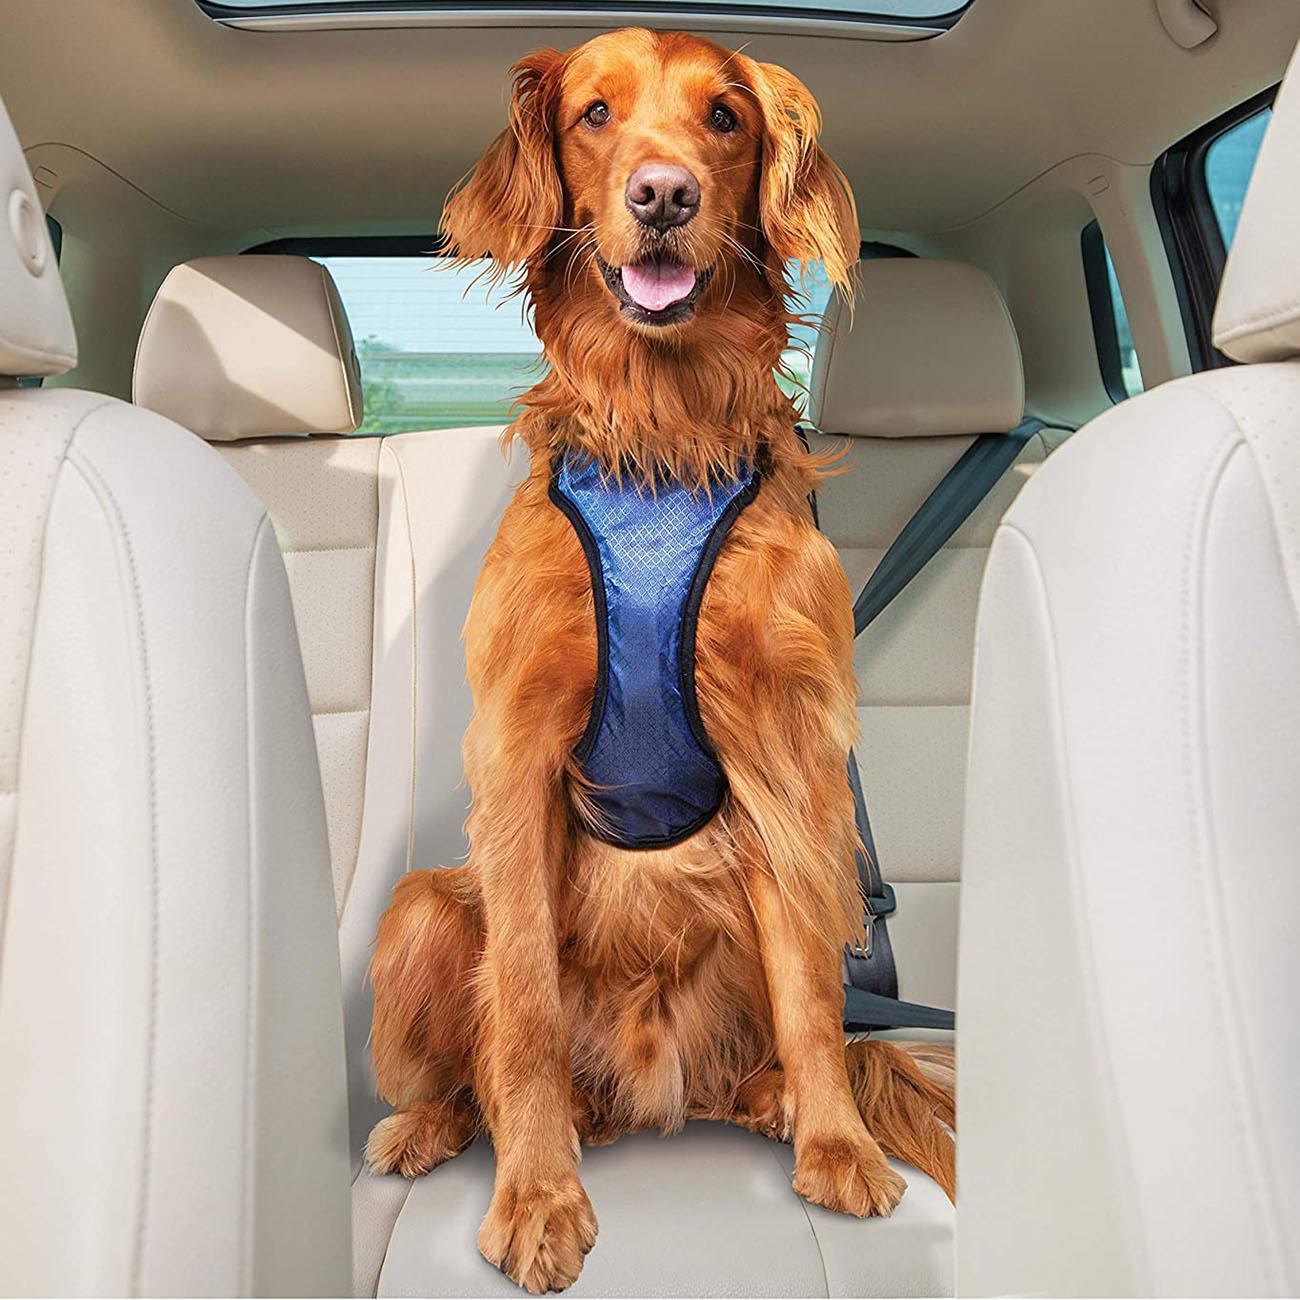 PetSafe Happy Ride Dog Safety Car Harness